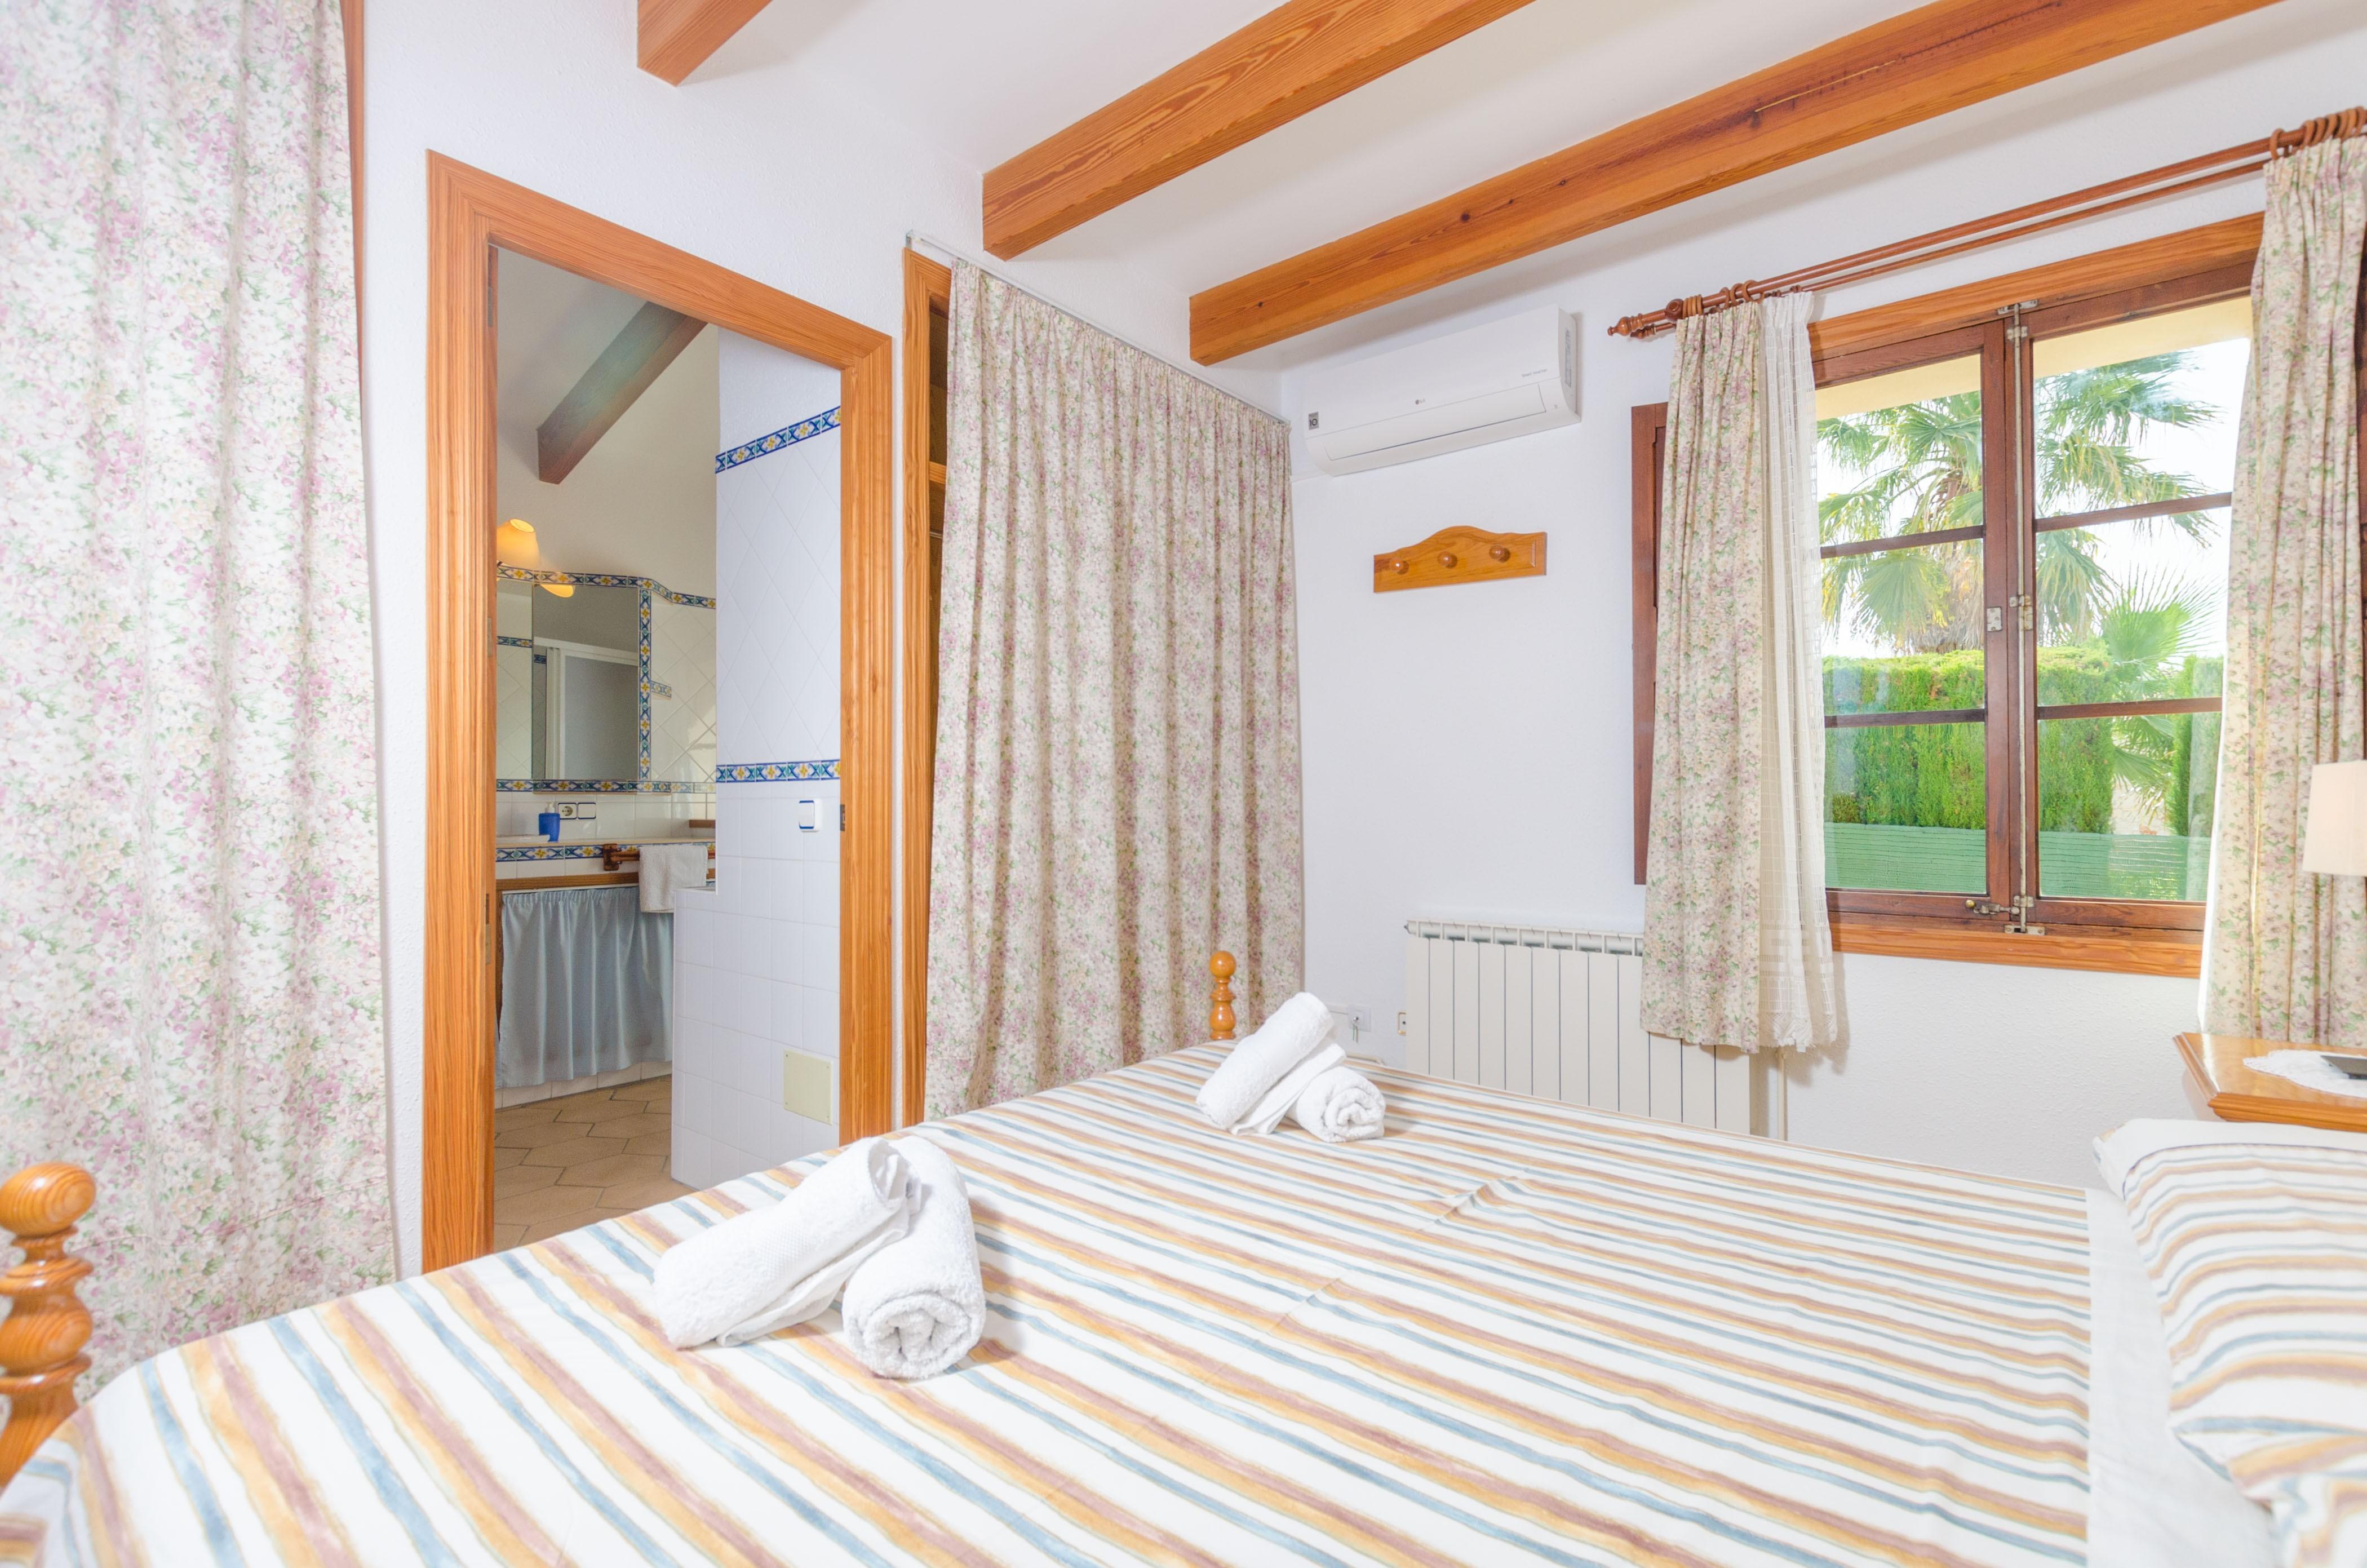 Maison de vacances SA SINIA (2374876), Lloret de Vistalegre, Majorque, Iles Baléares, Espagne, image 23